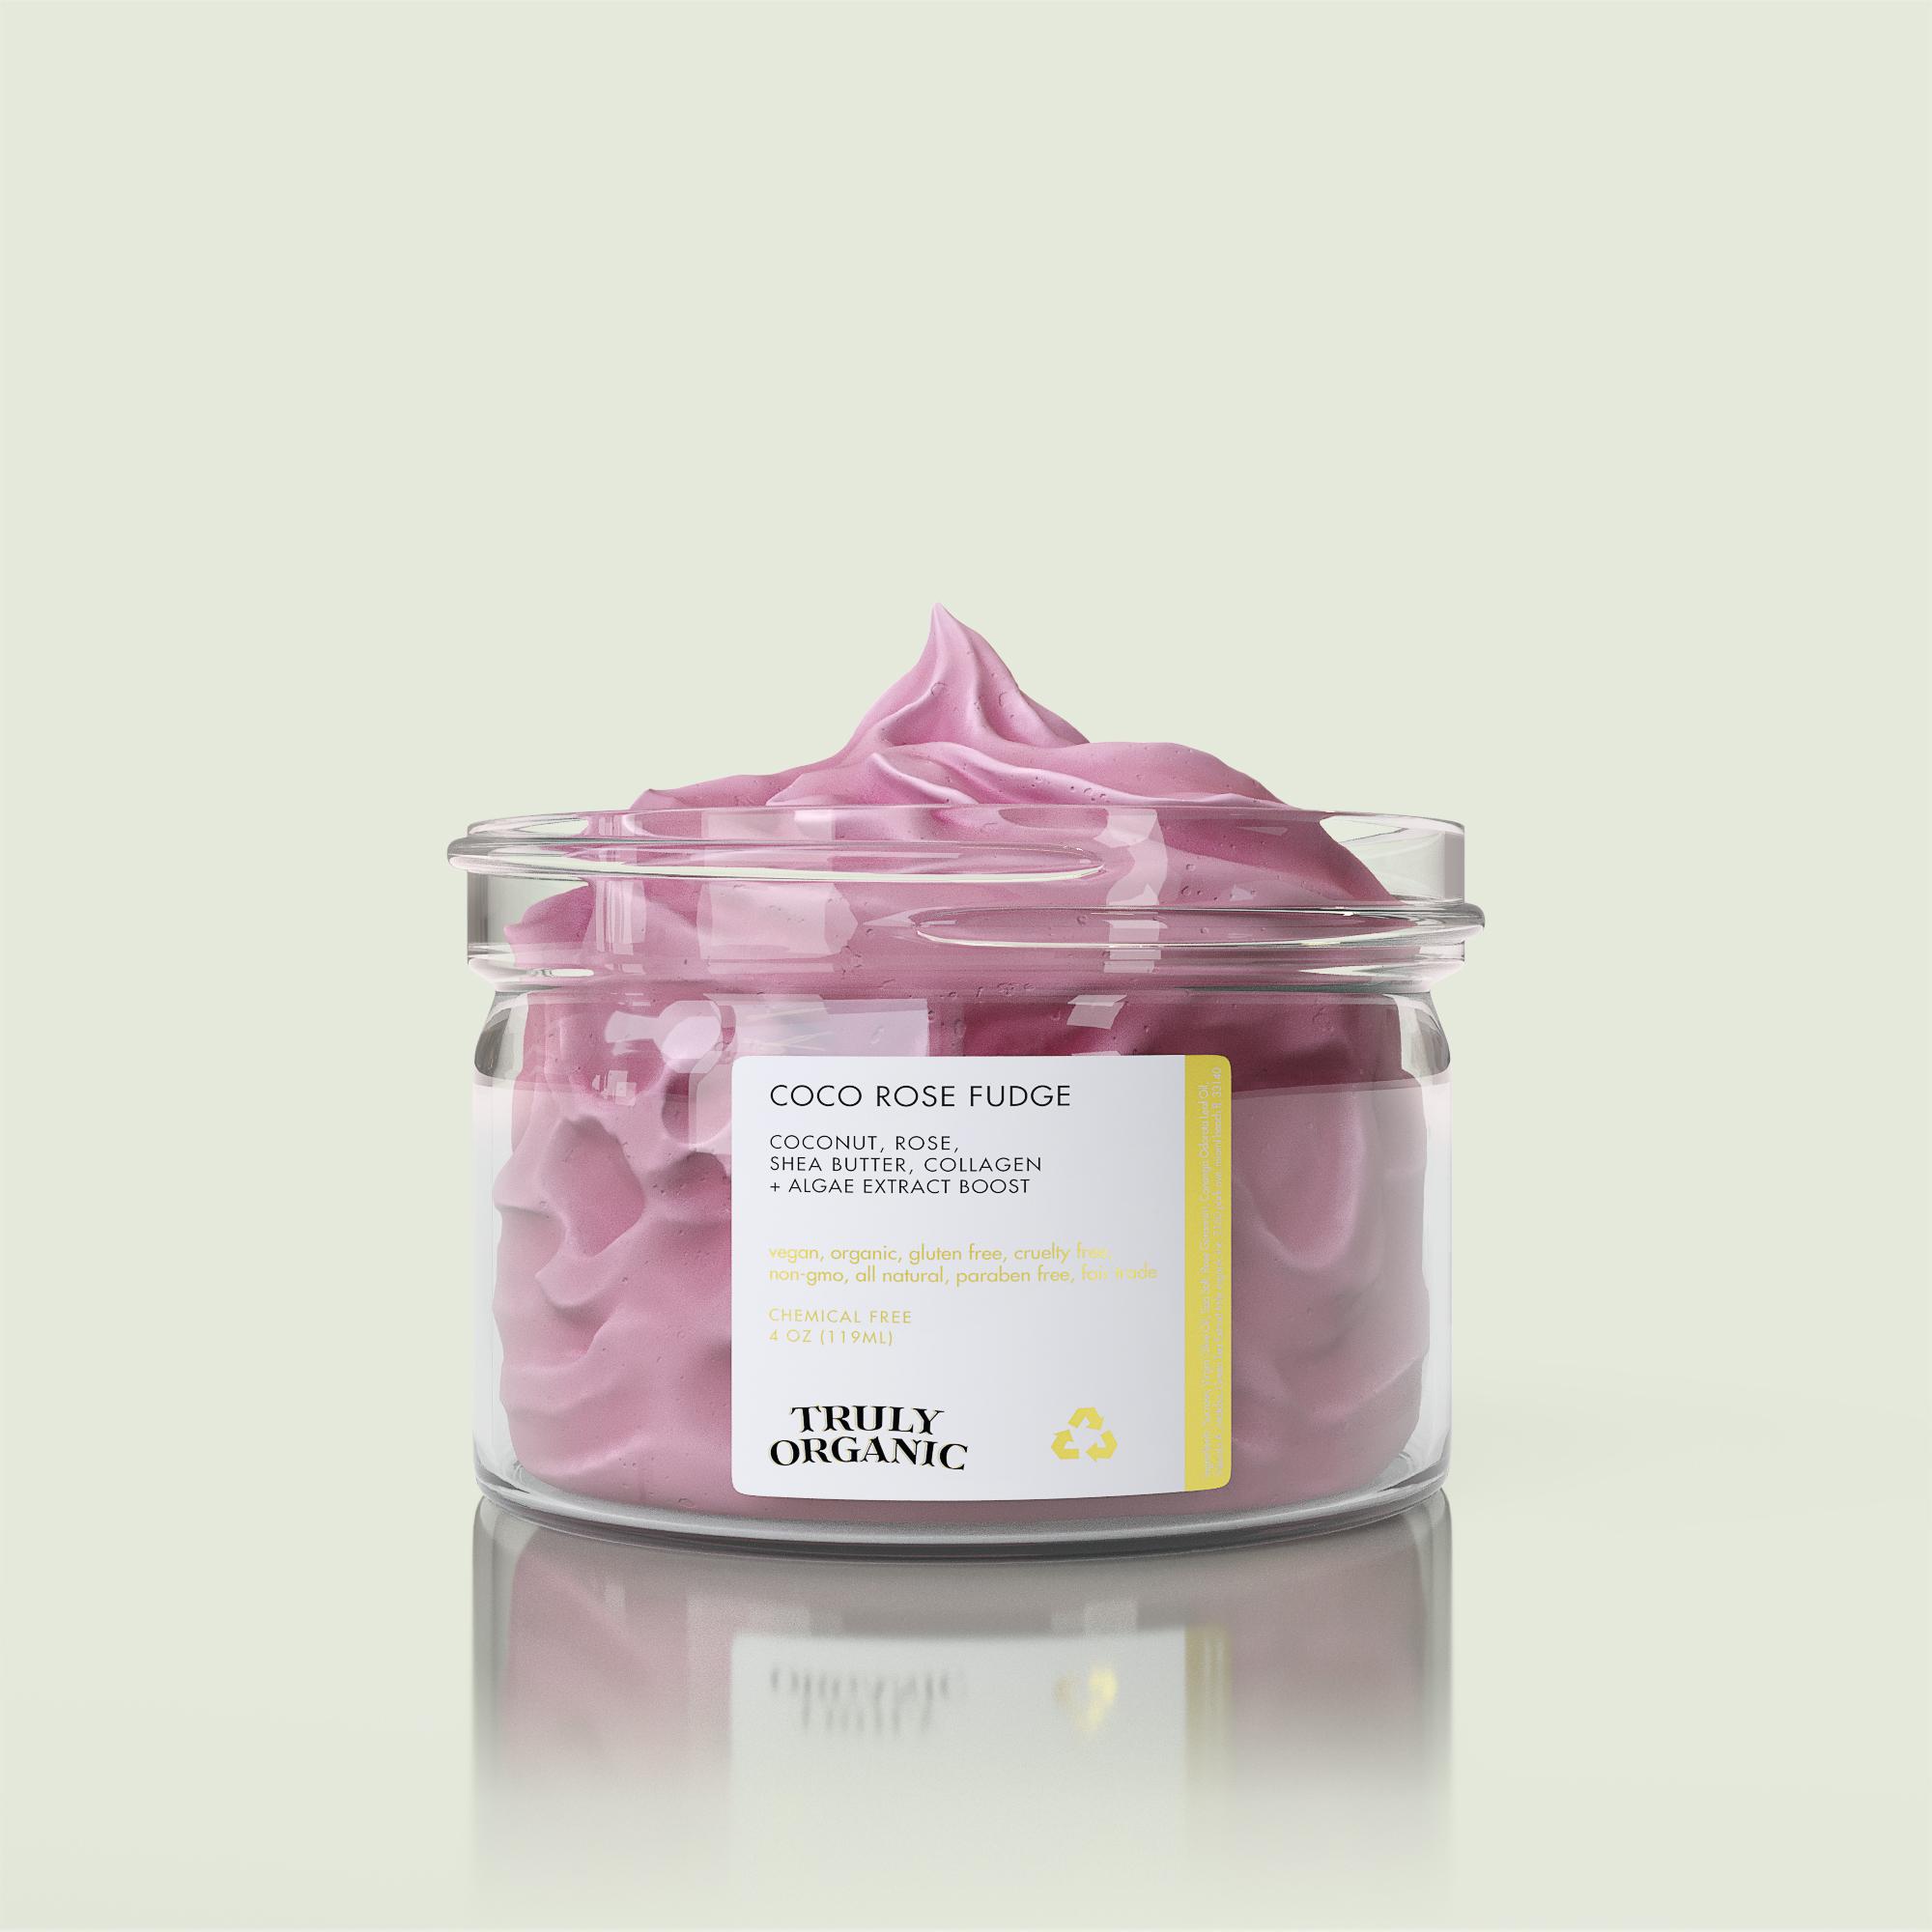 Truly Organic Coco Rose Fudge Body Butter